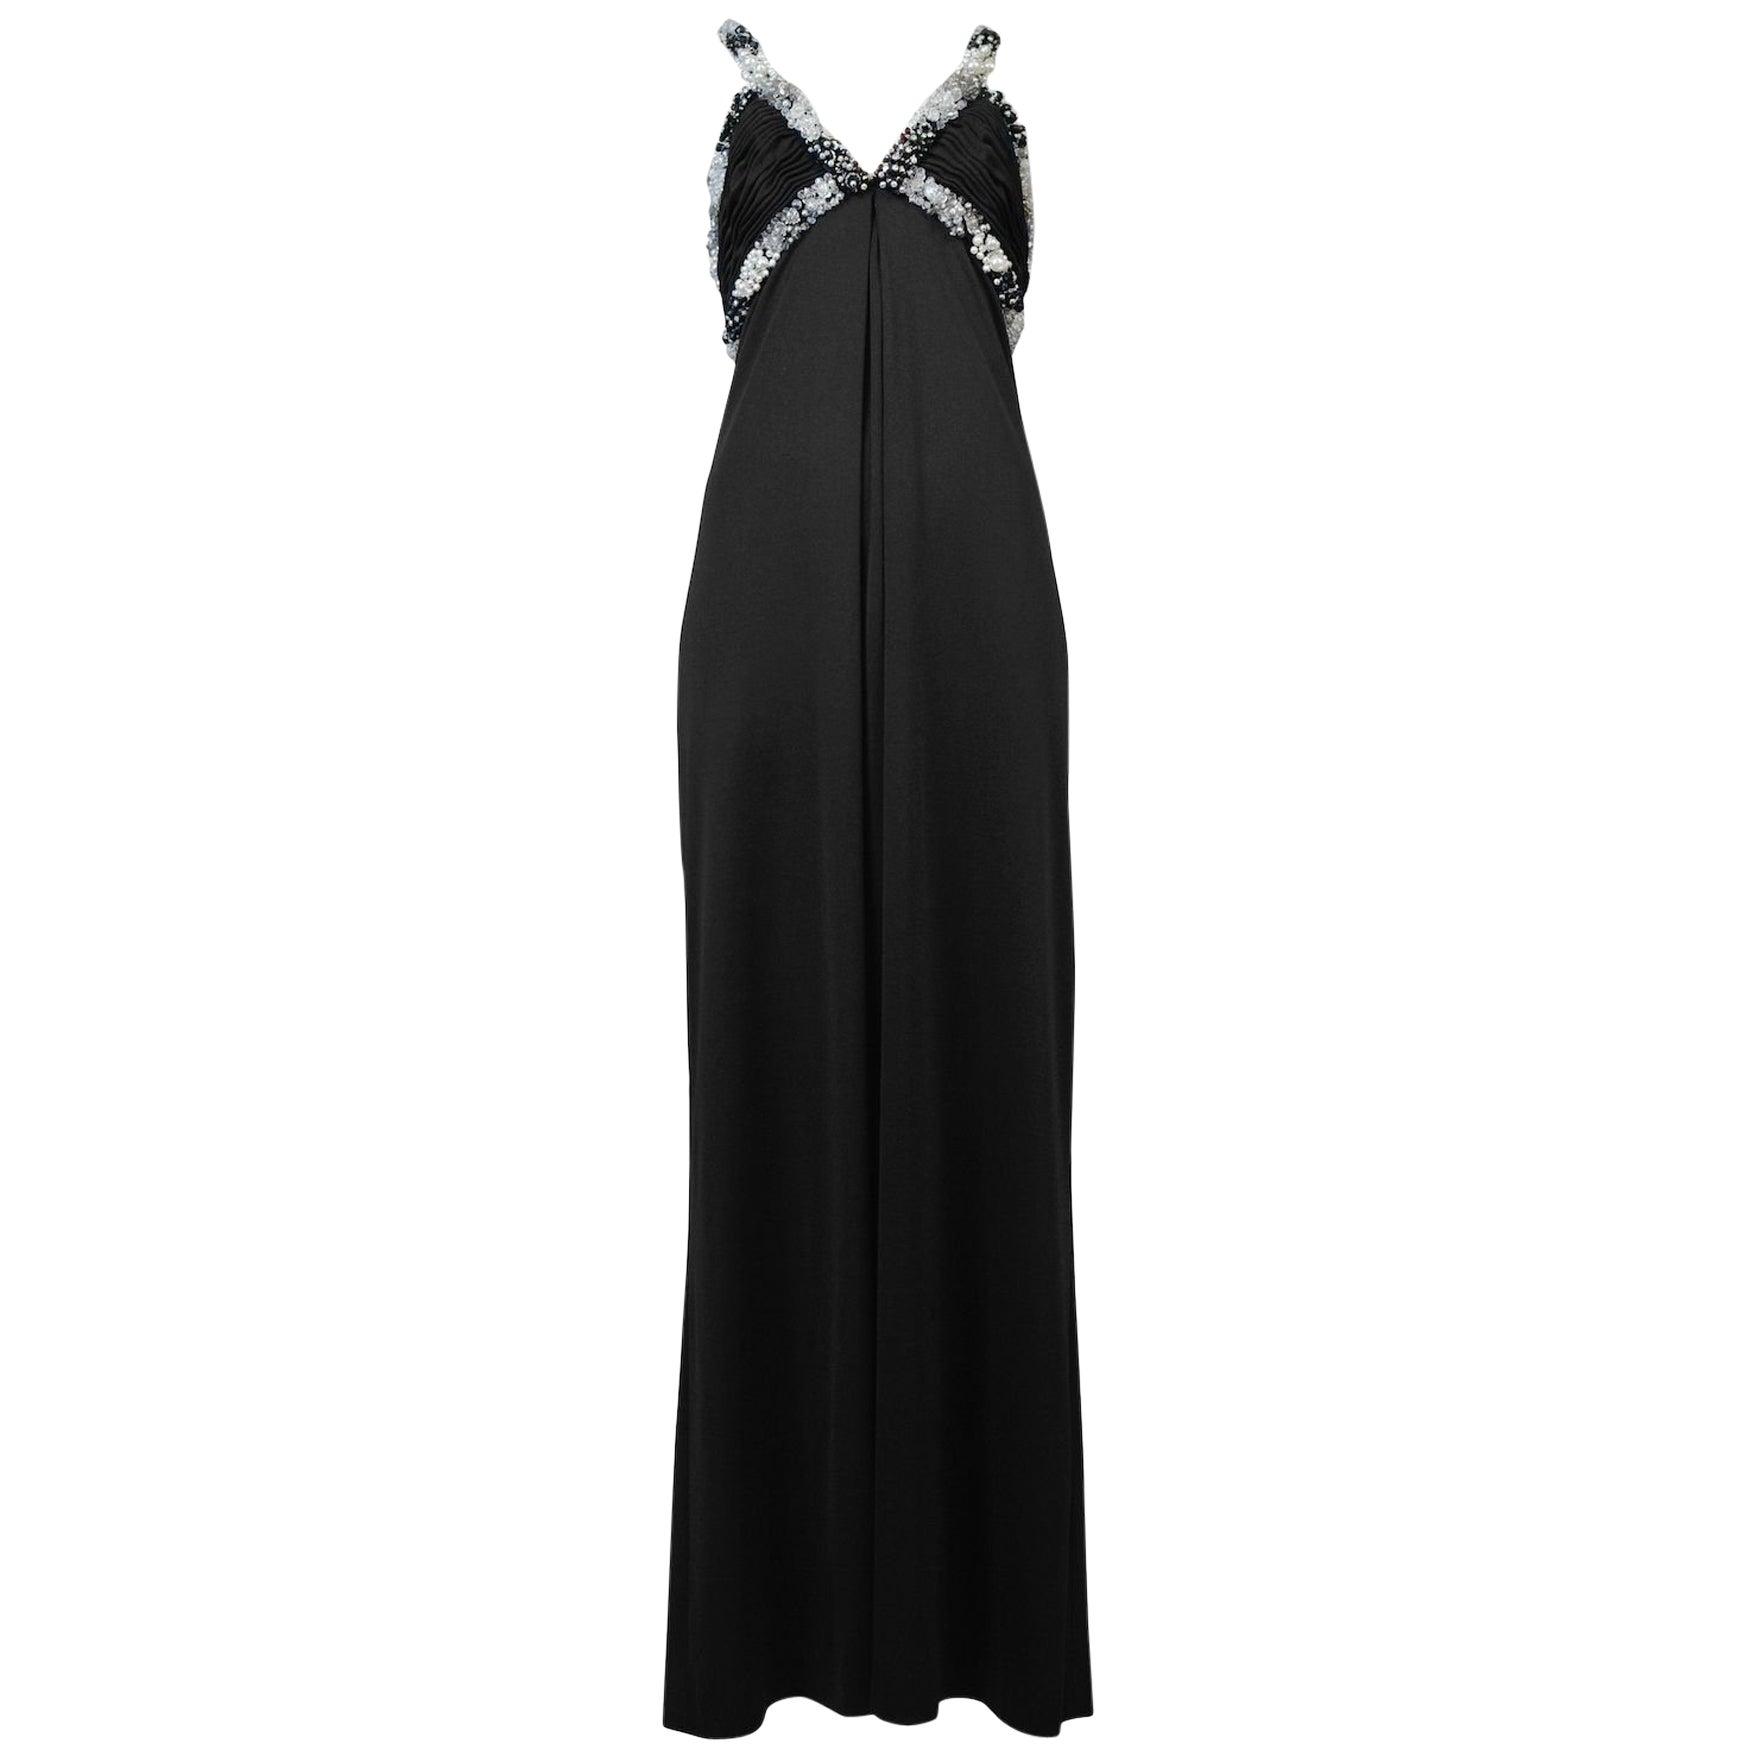 Loris Azzaro Black Beaded Gown